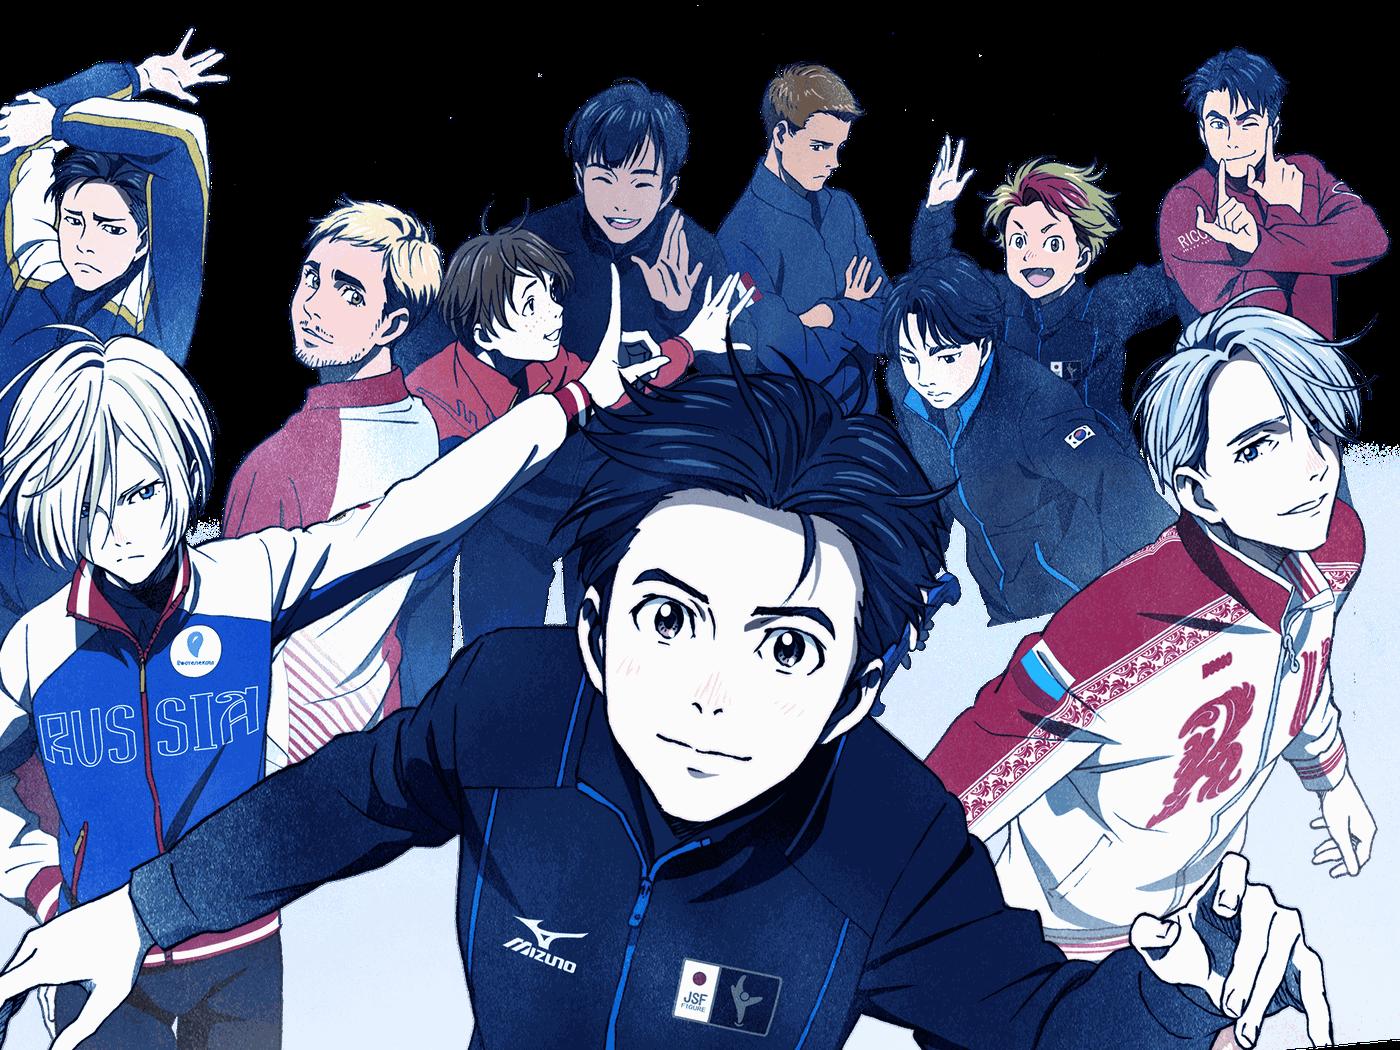 yuri on ice sports anime